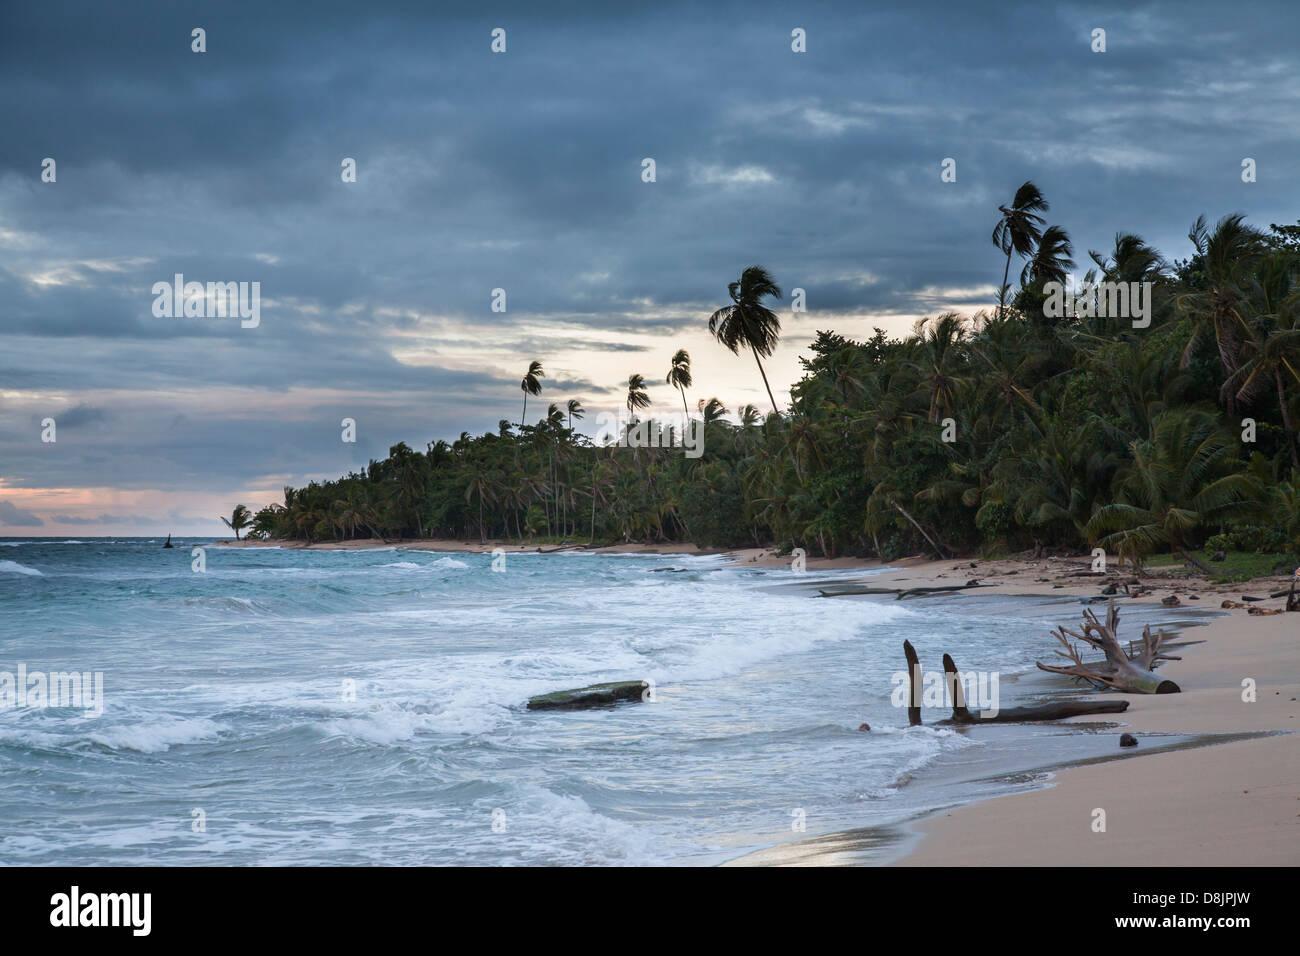 Punta Uva Beach, between Puerto Viejo and Manzanillo, Costa Rica - Stock Image